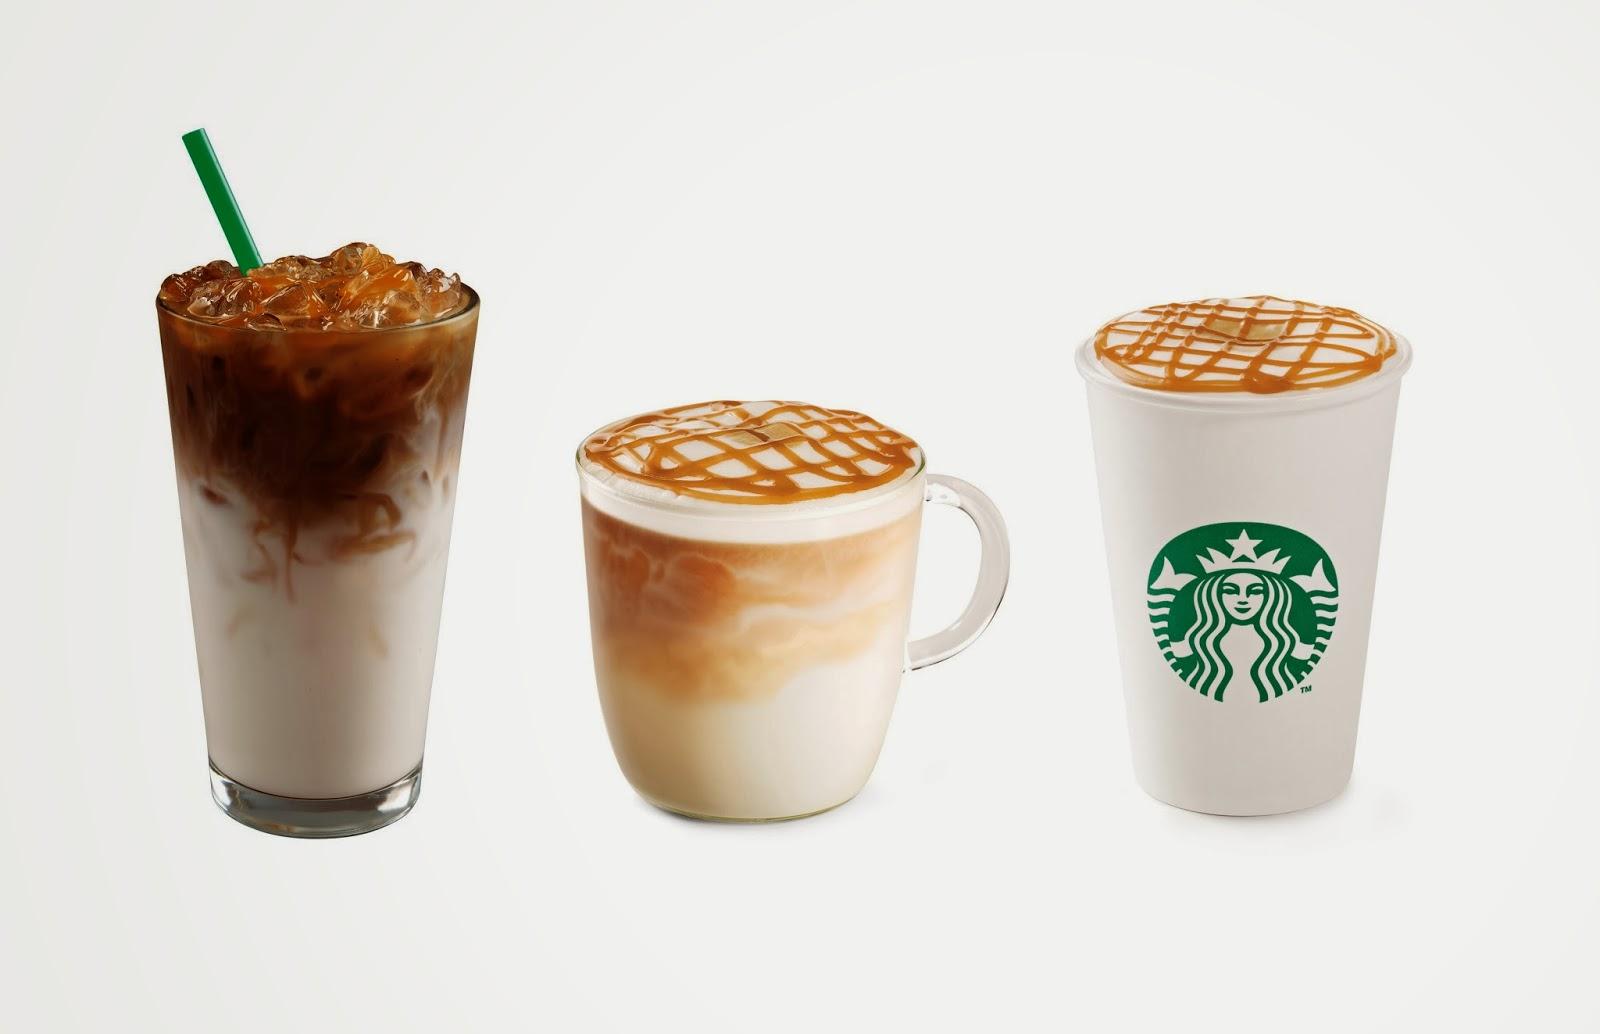 Starbucks caramel macchiato